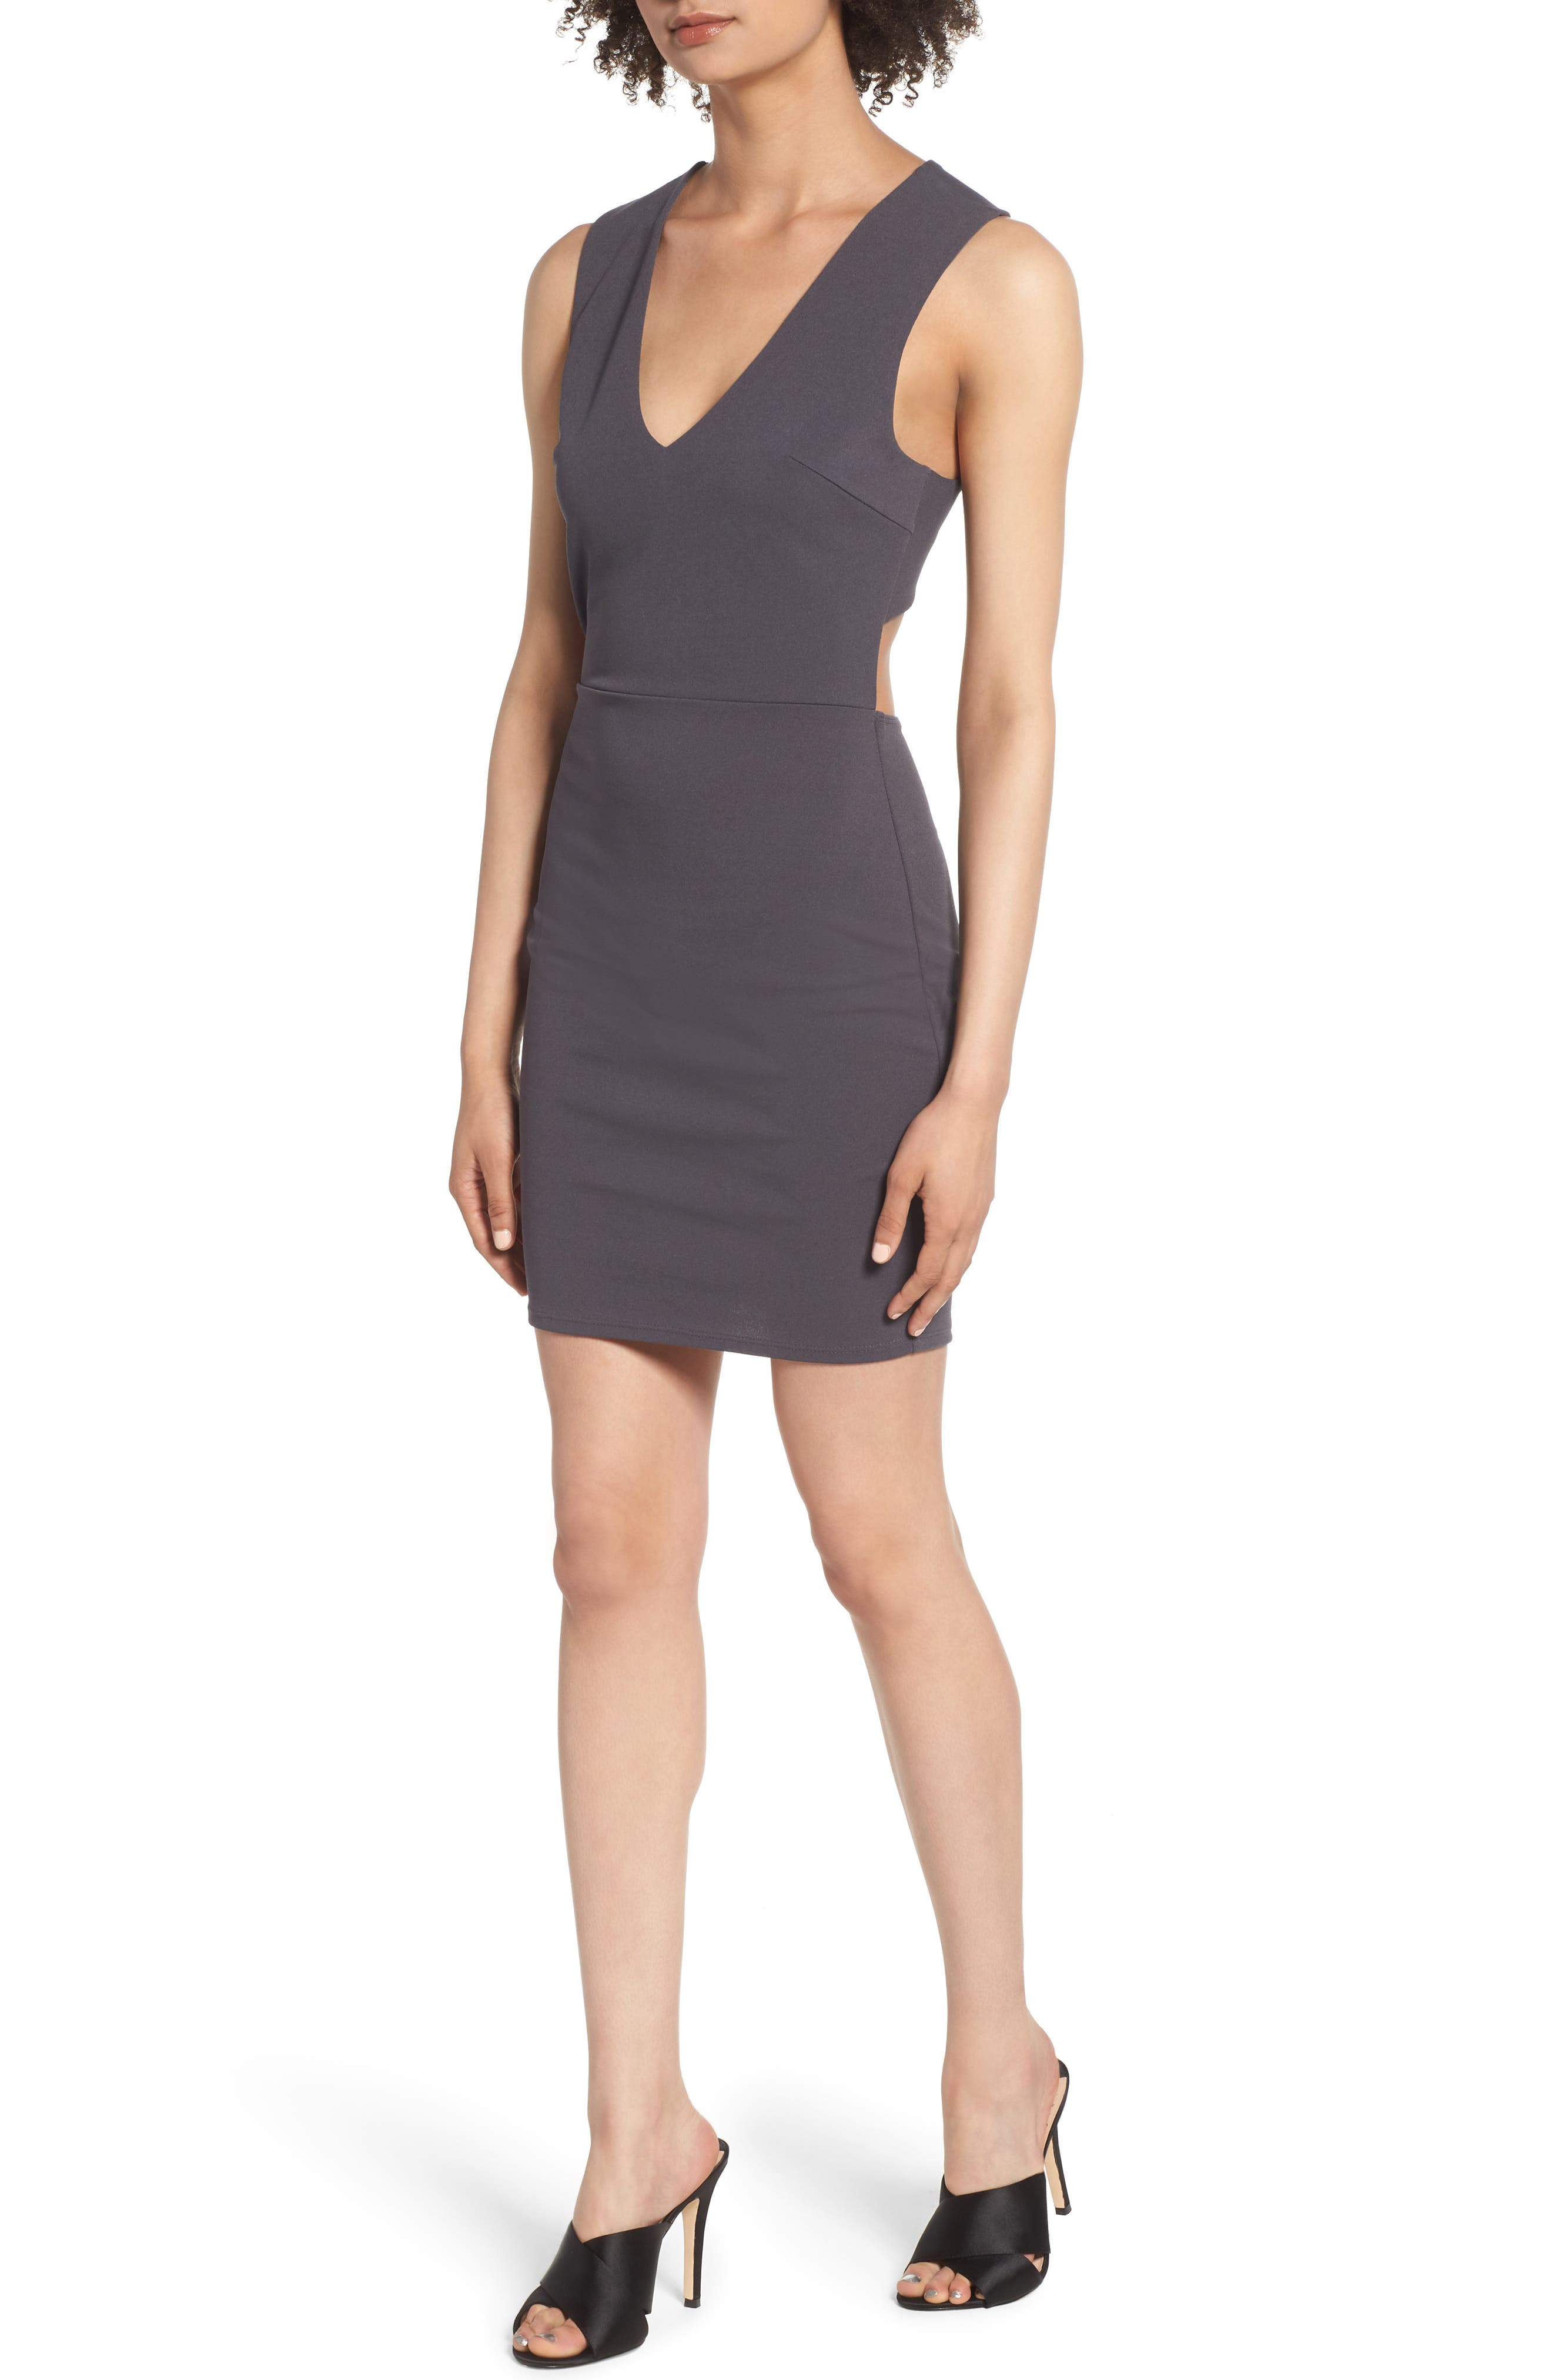 SOPRANO, Crossback Body-Con Dress, Main thumbnail 1, color, 020